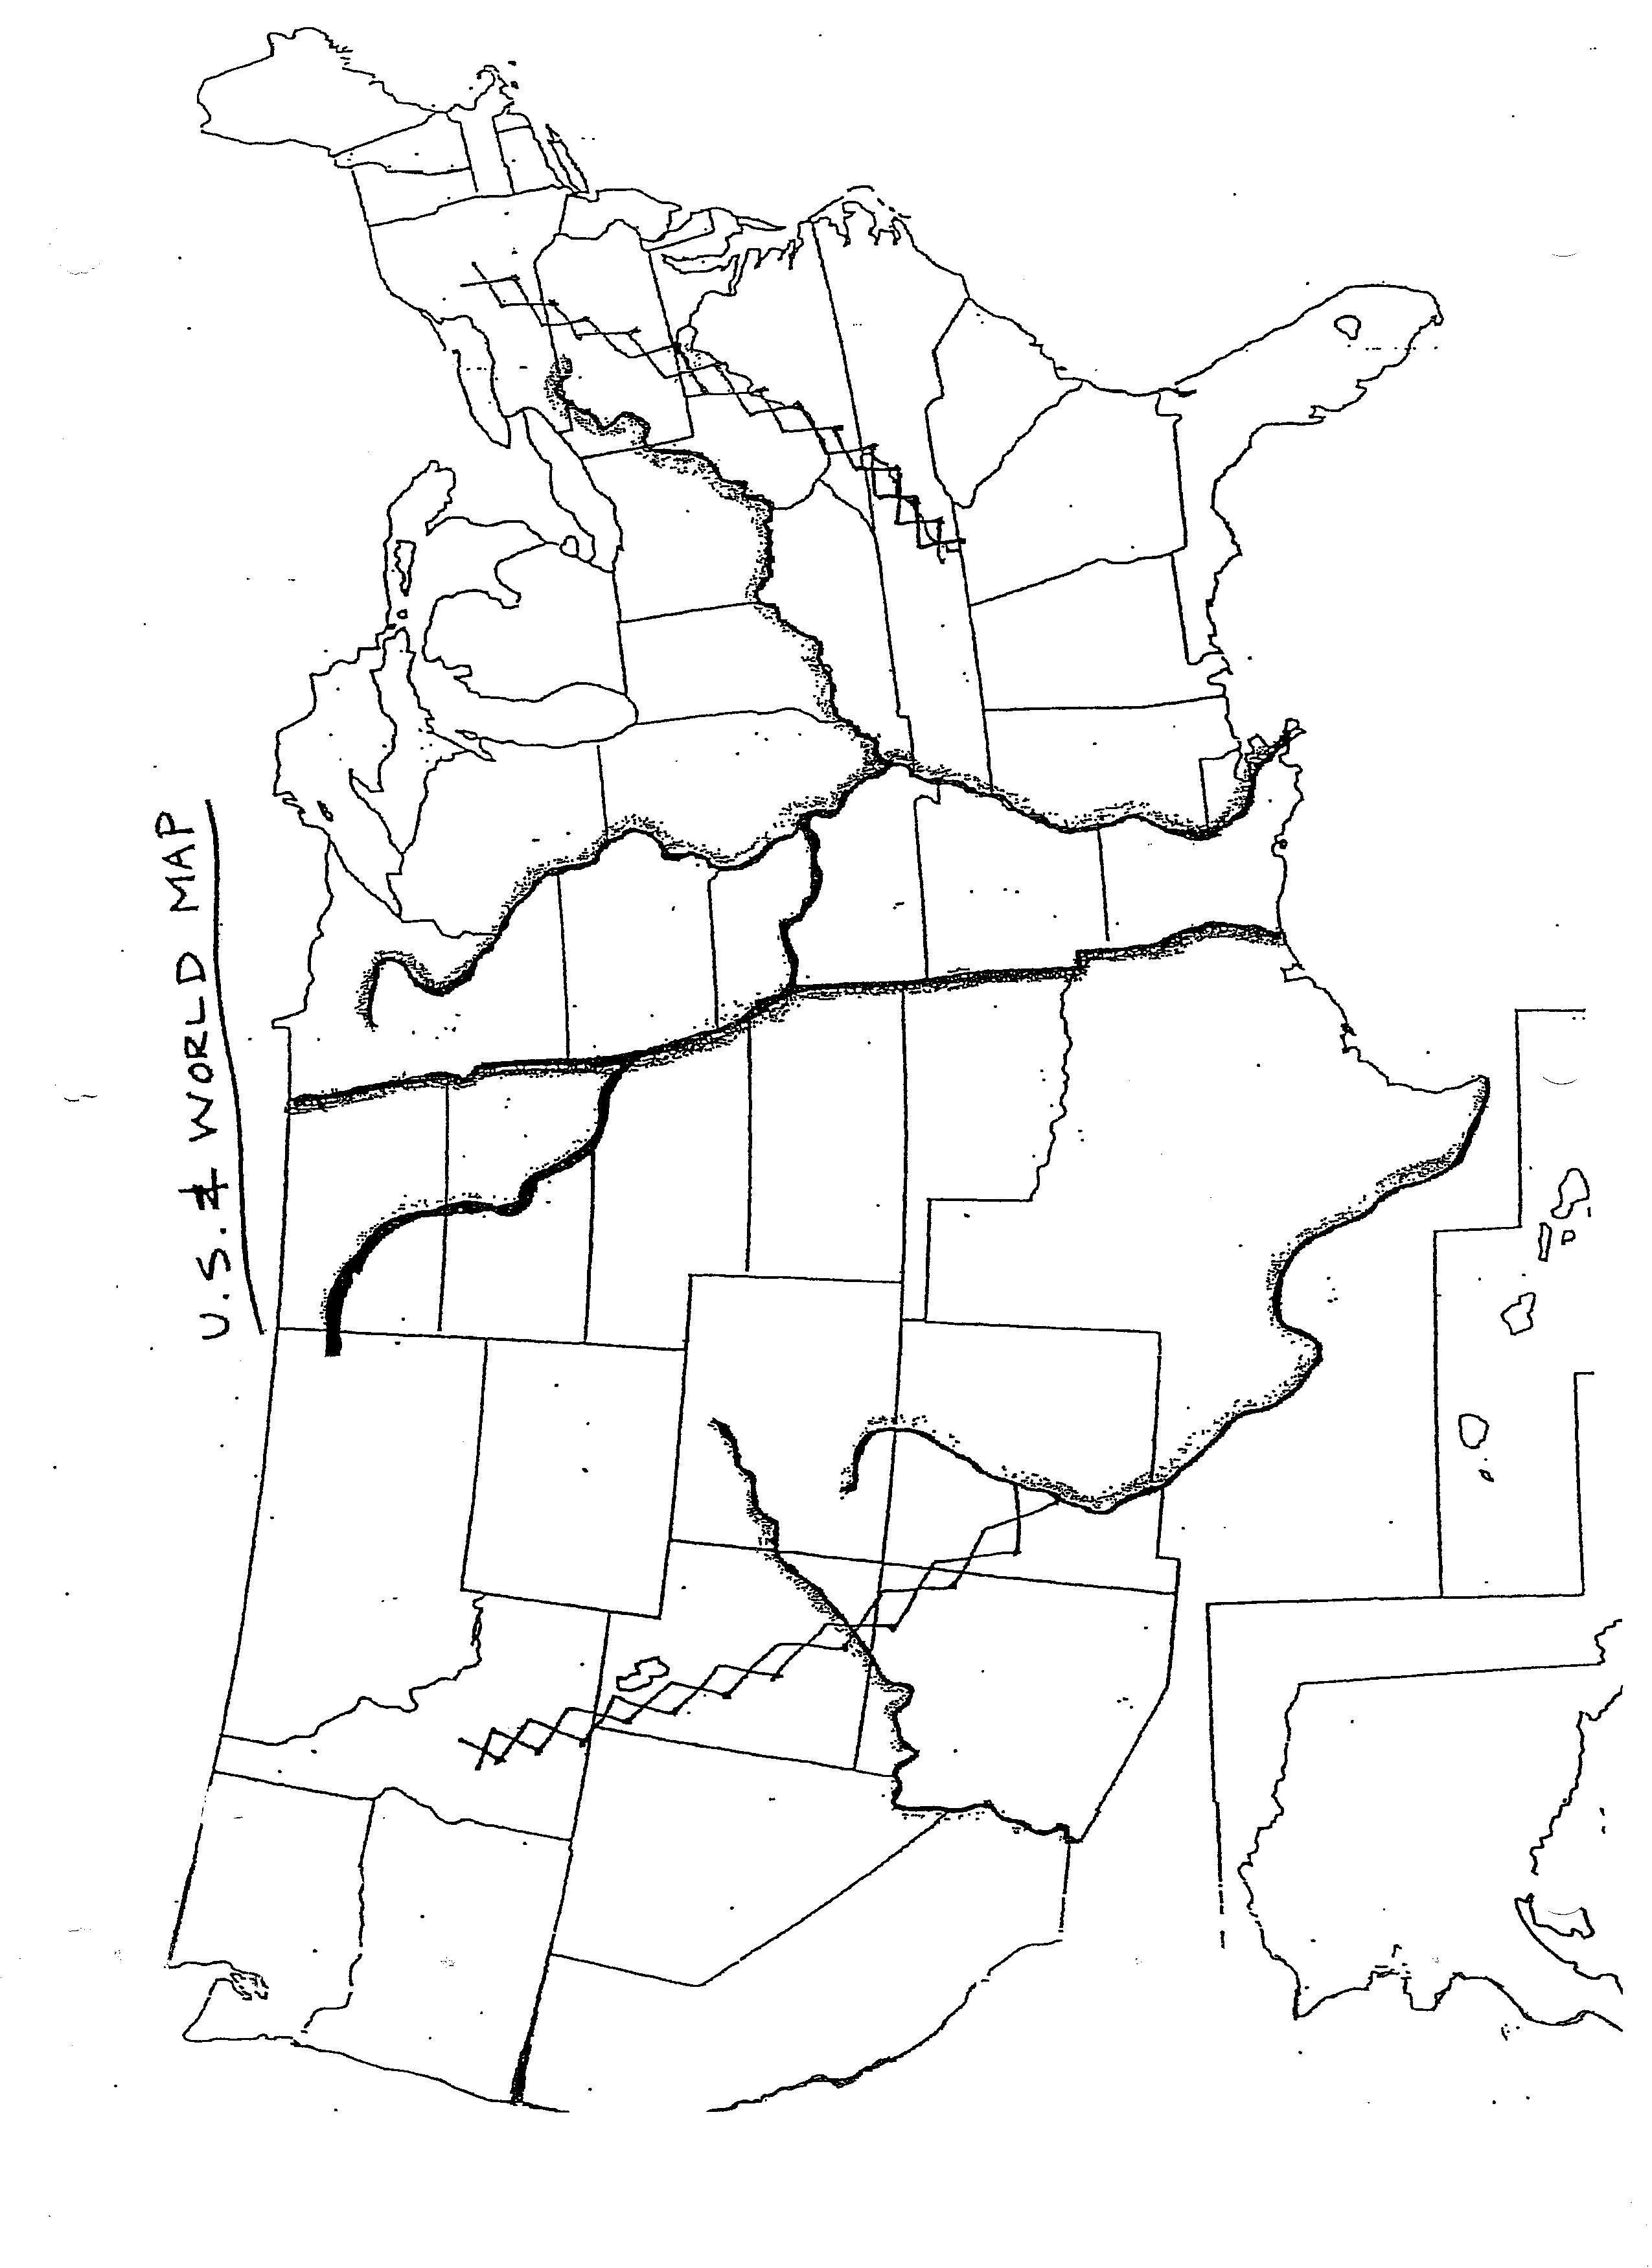 Drawing A Us Map Globalinterco - Us map line drawing